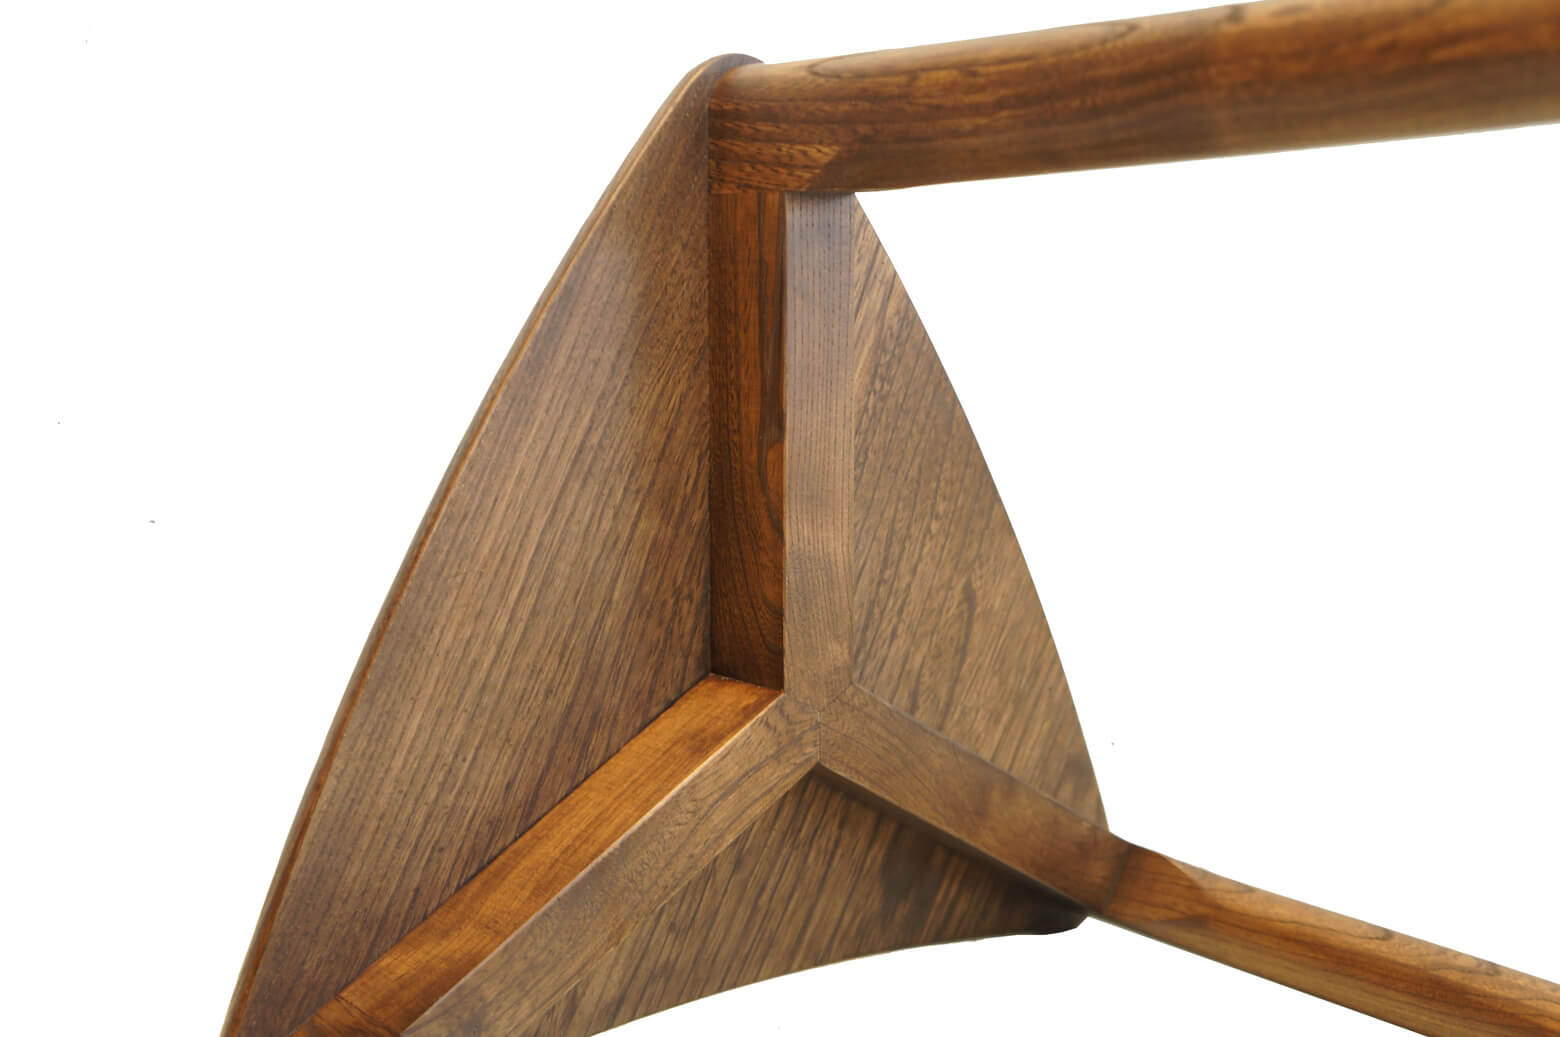 Kukan Kobo Triangular Stacking Stool/空間工房 三角スタッキングスツール 1